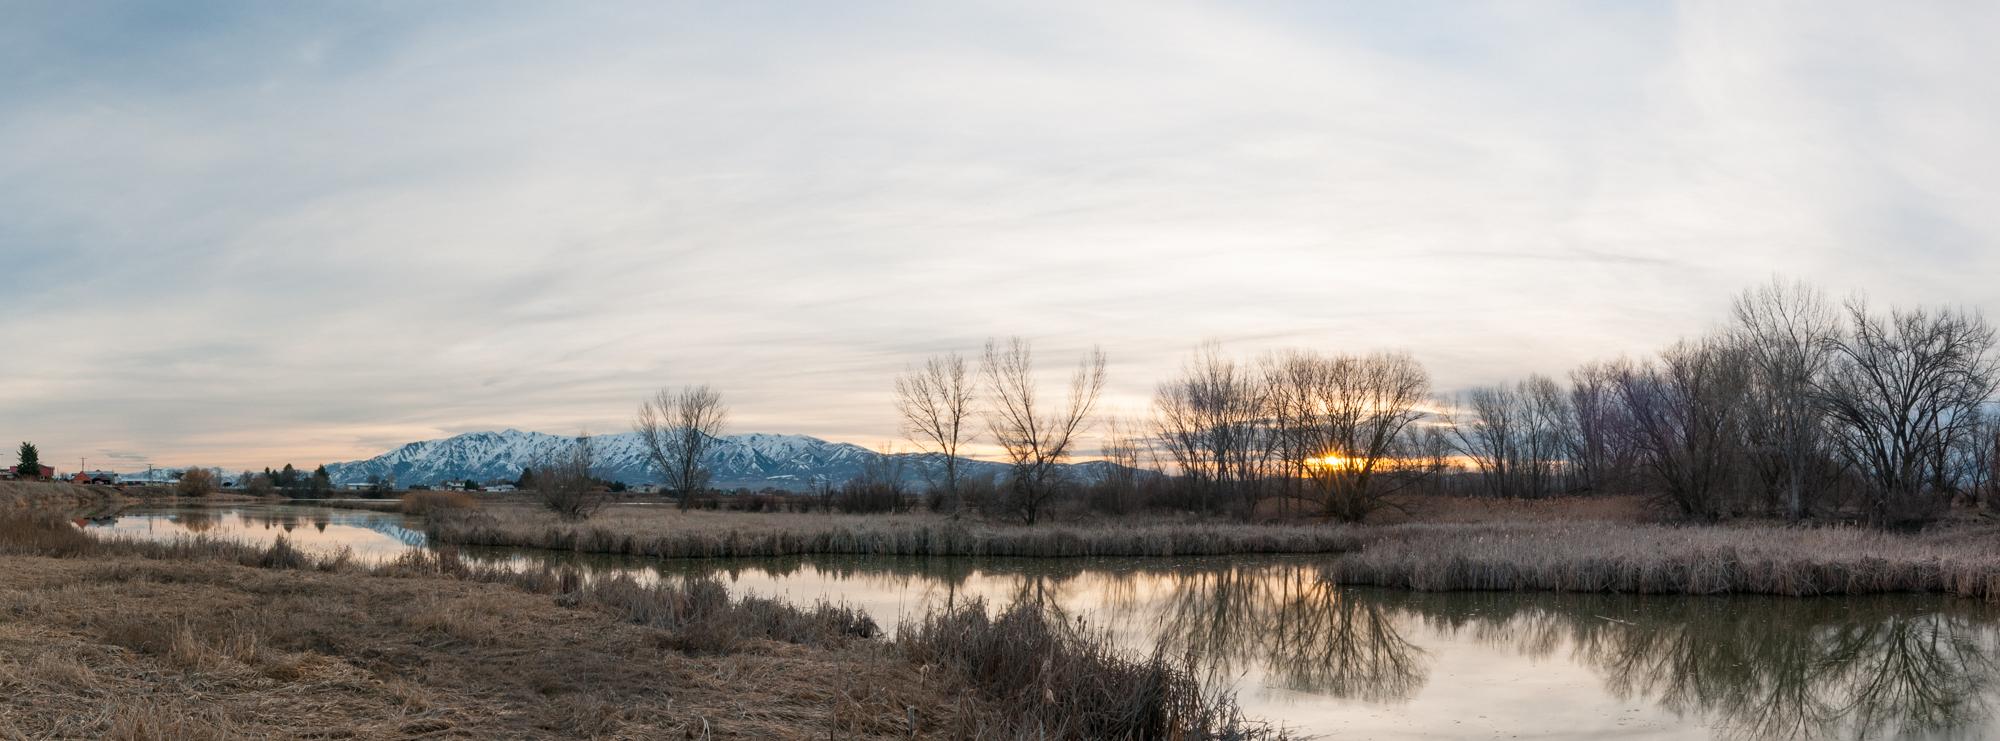 Marsh, Benson, Utah, 2016